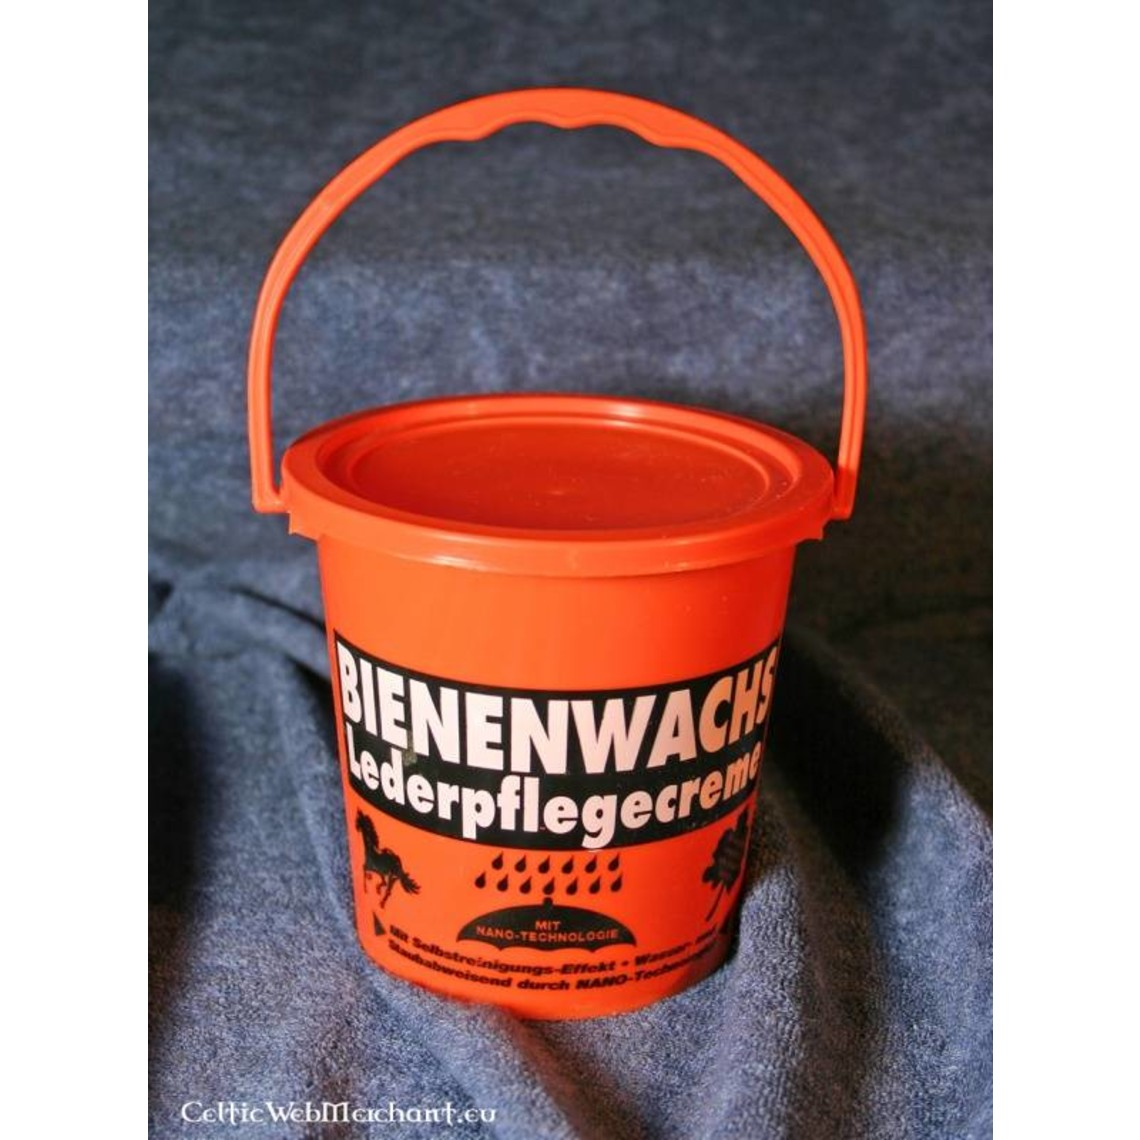 Beewax Lederpflege 450 ml